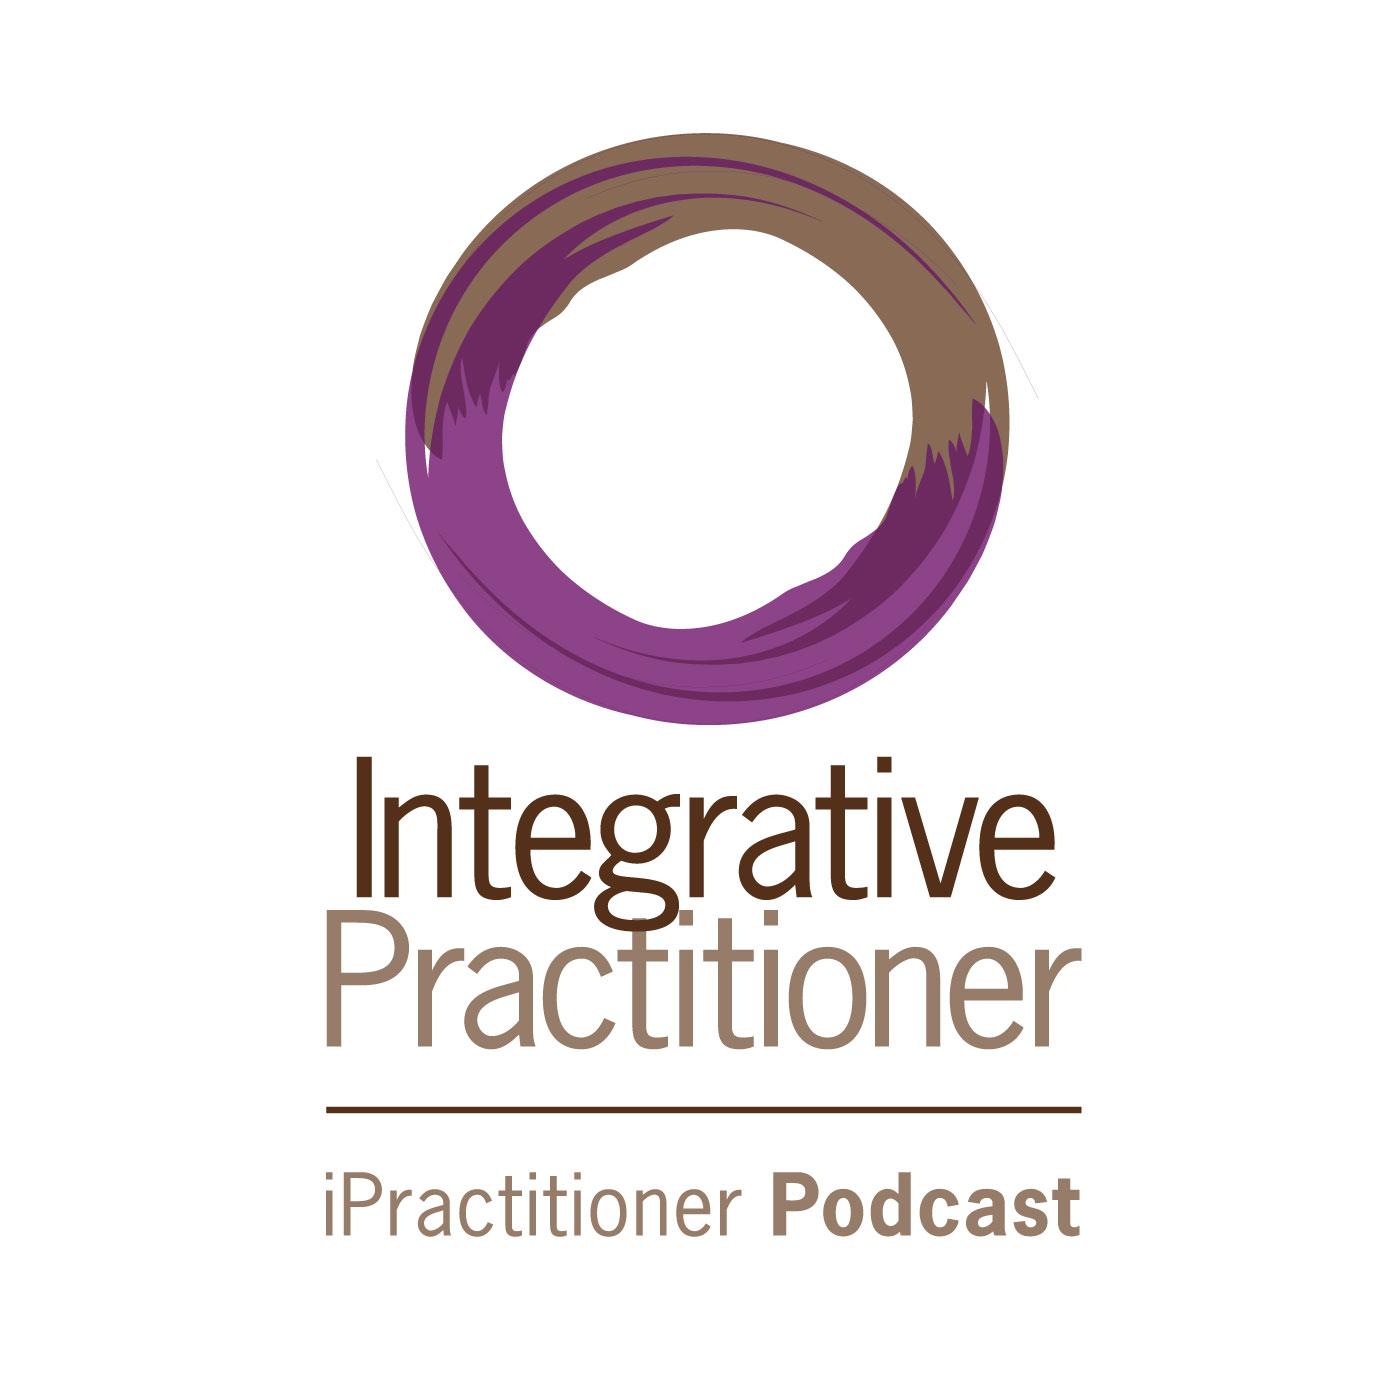 Integrative Practitioner Podcast show art